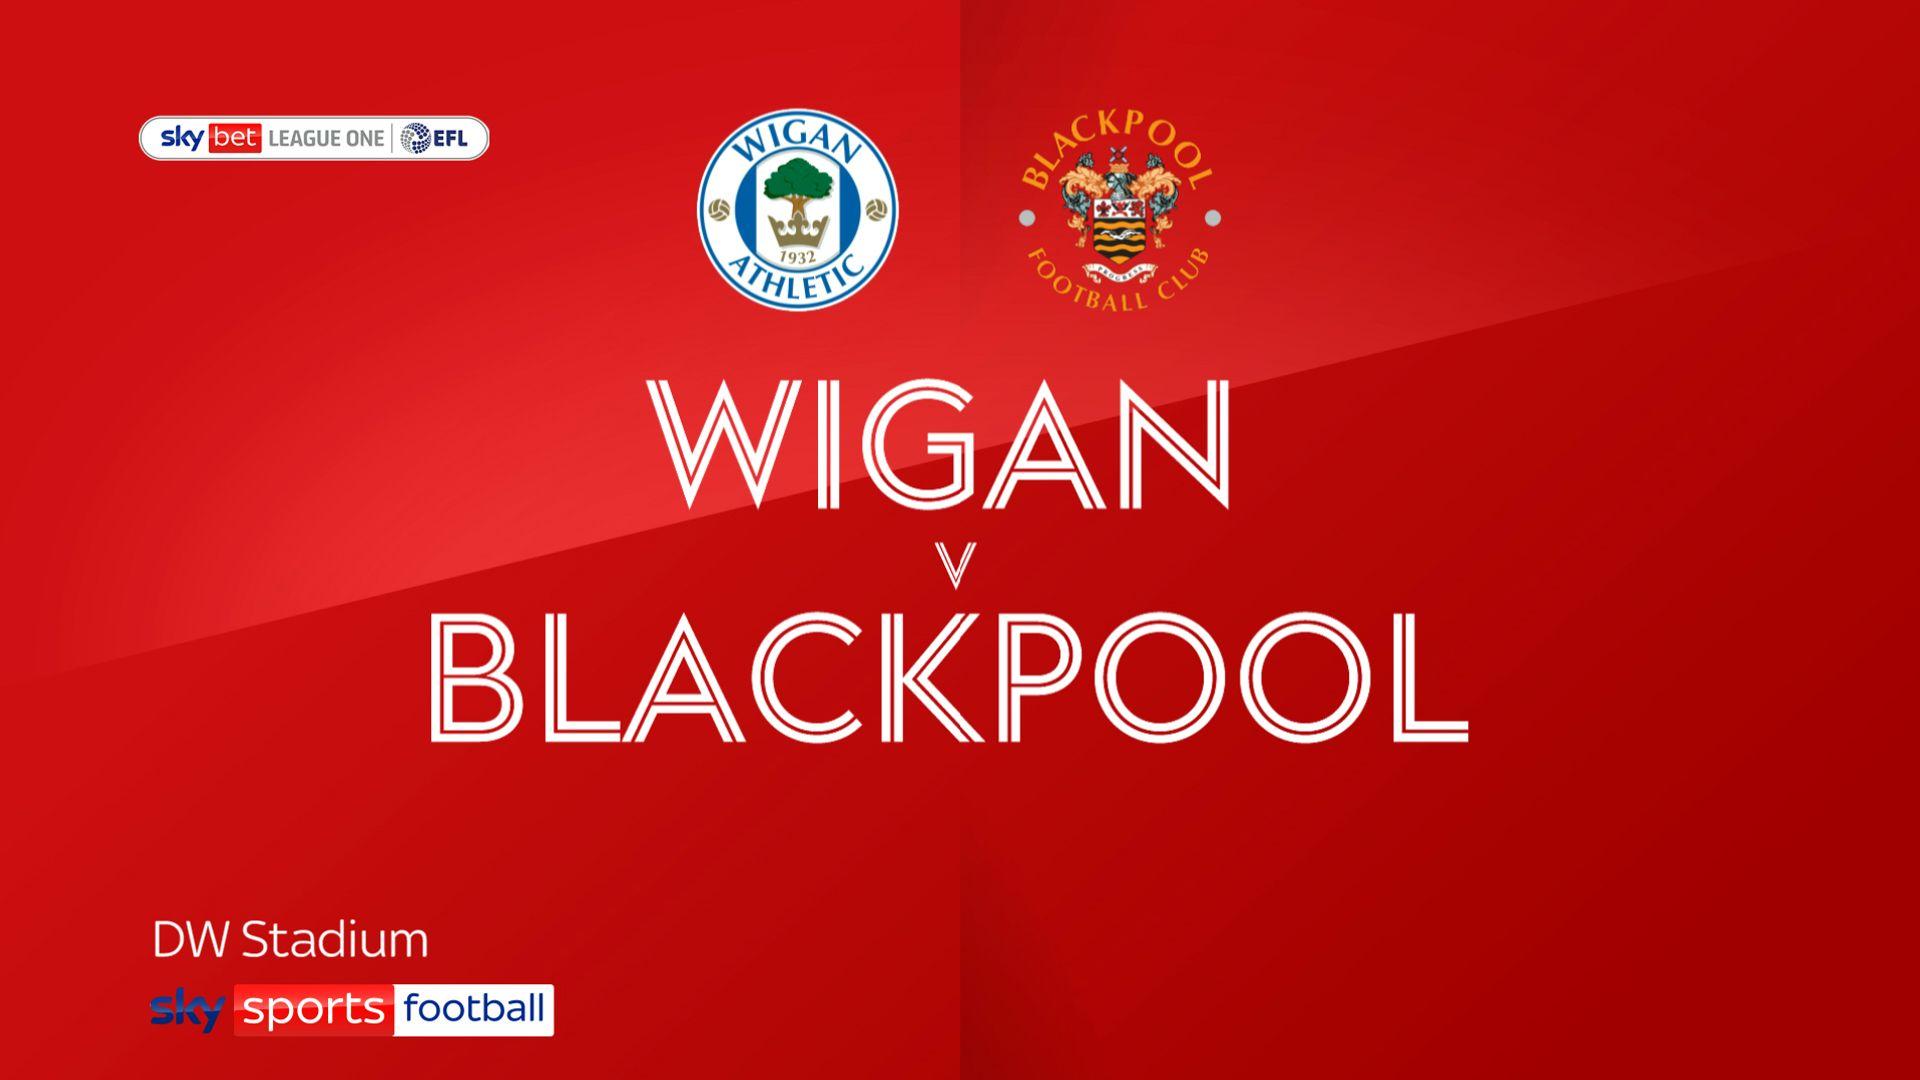 Five-star Blackpool thrash Wigan